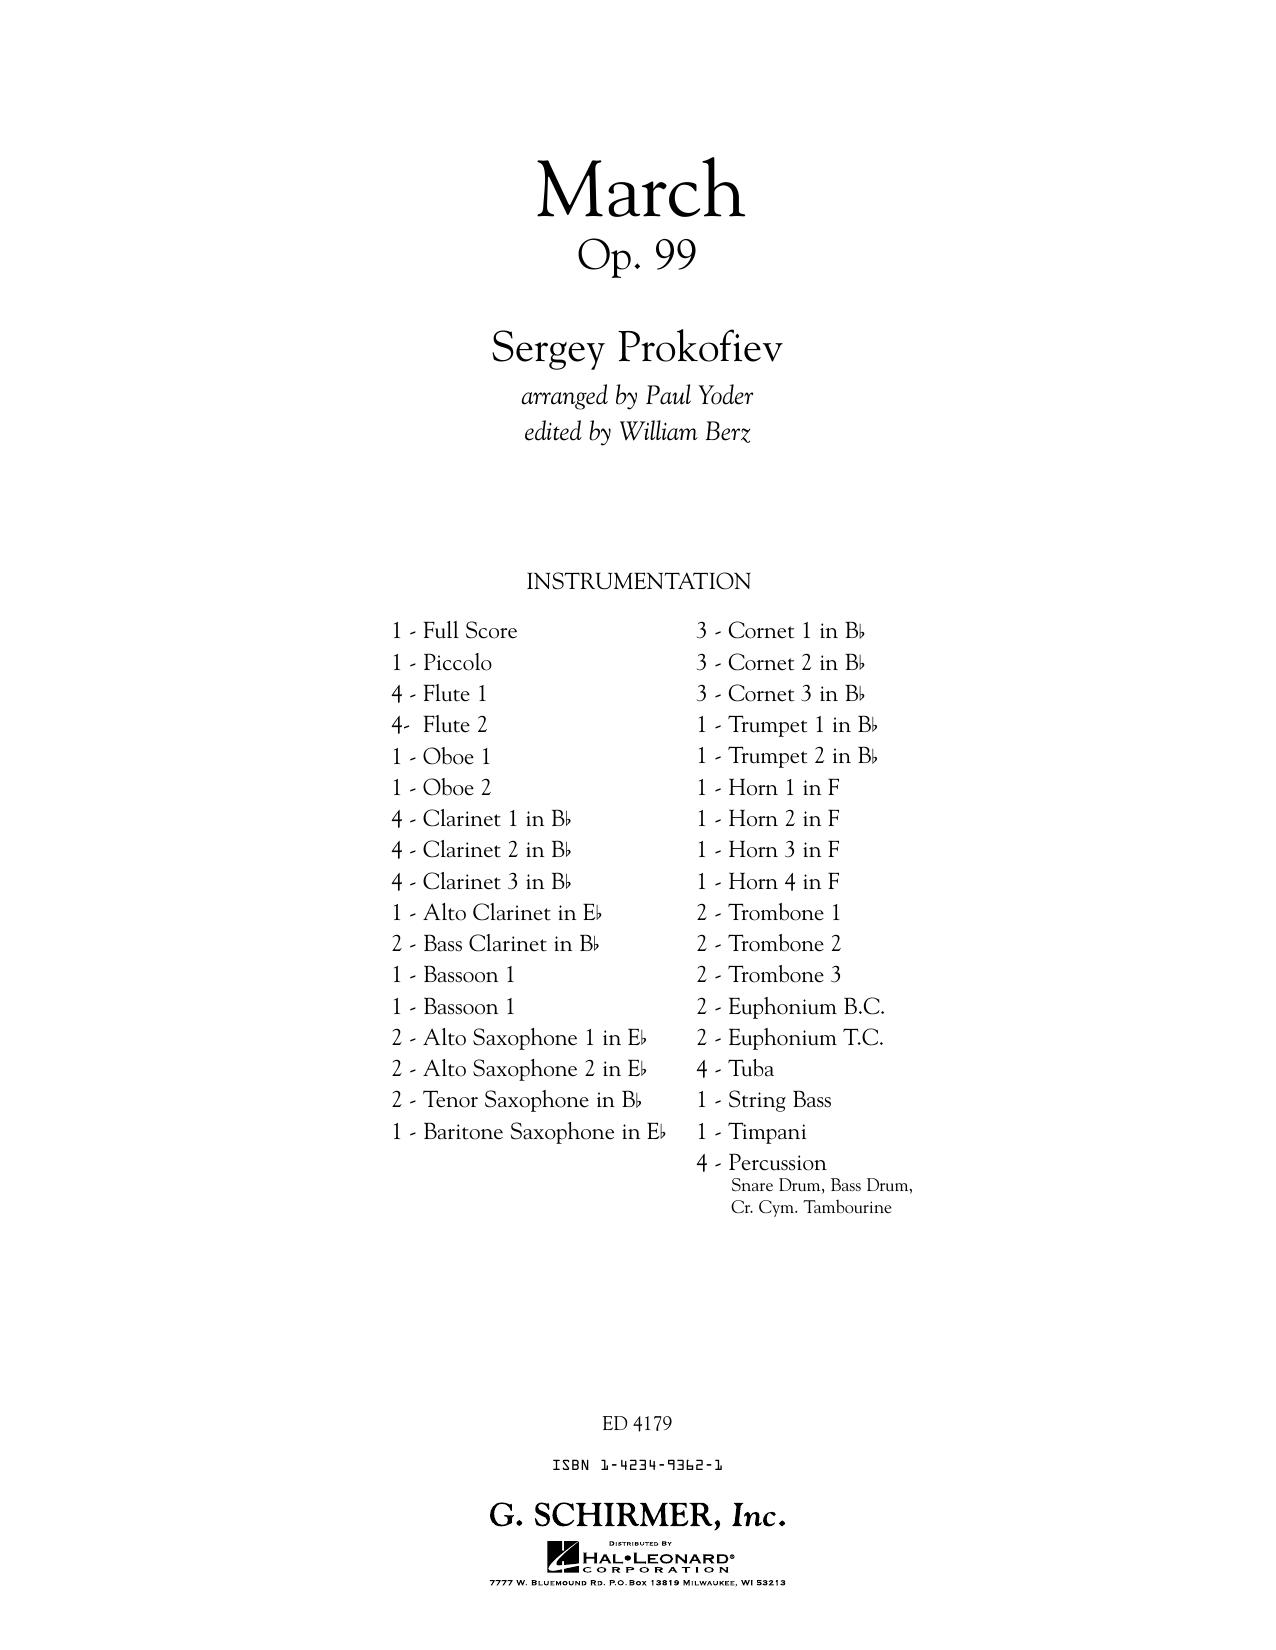 Paul Yoder March, Op. 99 - Conductor Score (Full Score) sheet music notes printable PDF score